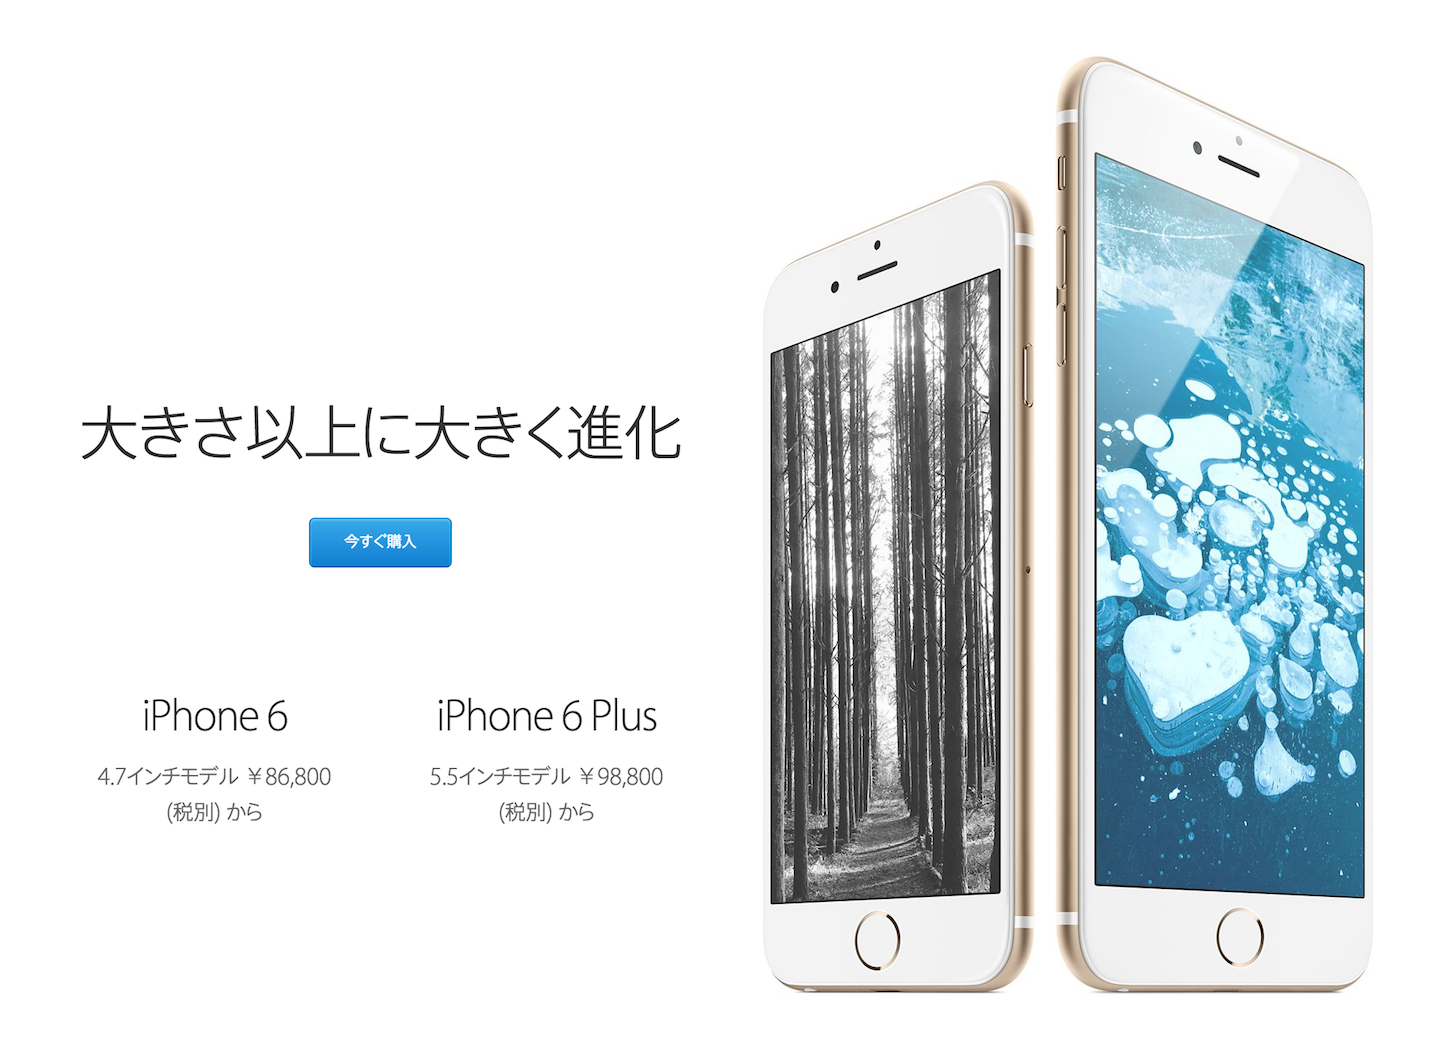 IPhone 6 6 Plus Apple Online Store